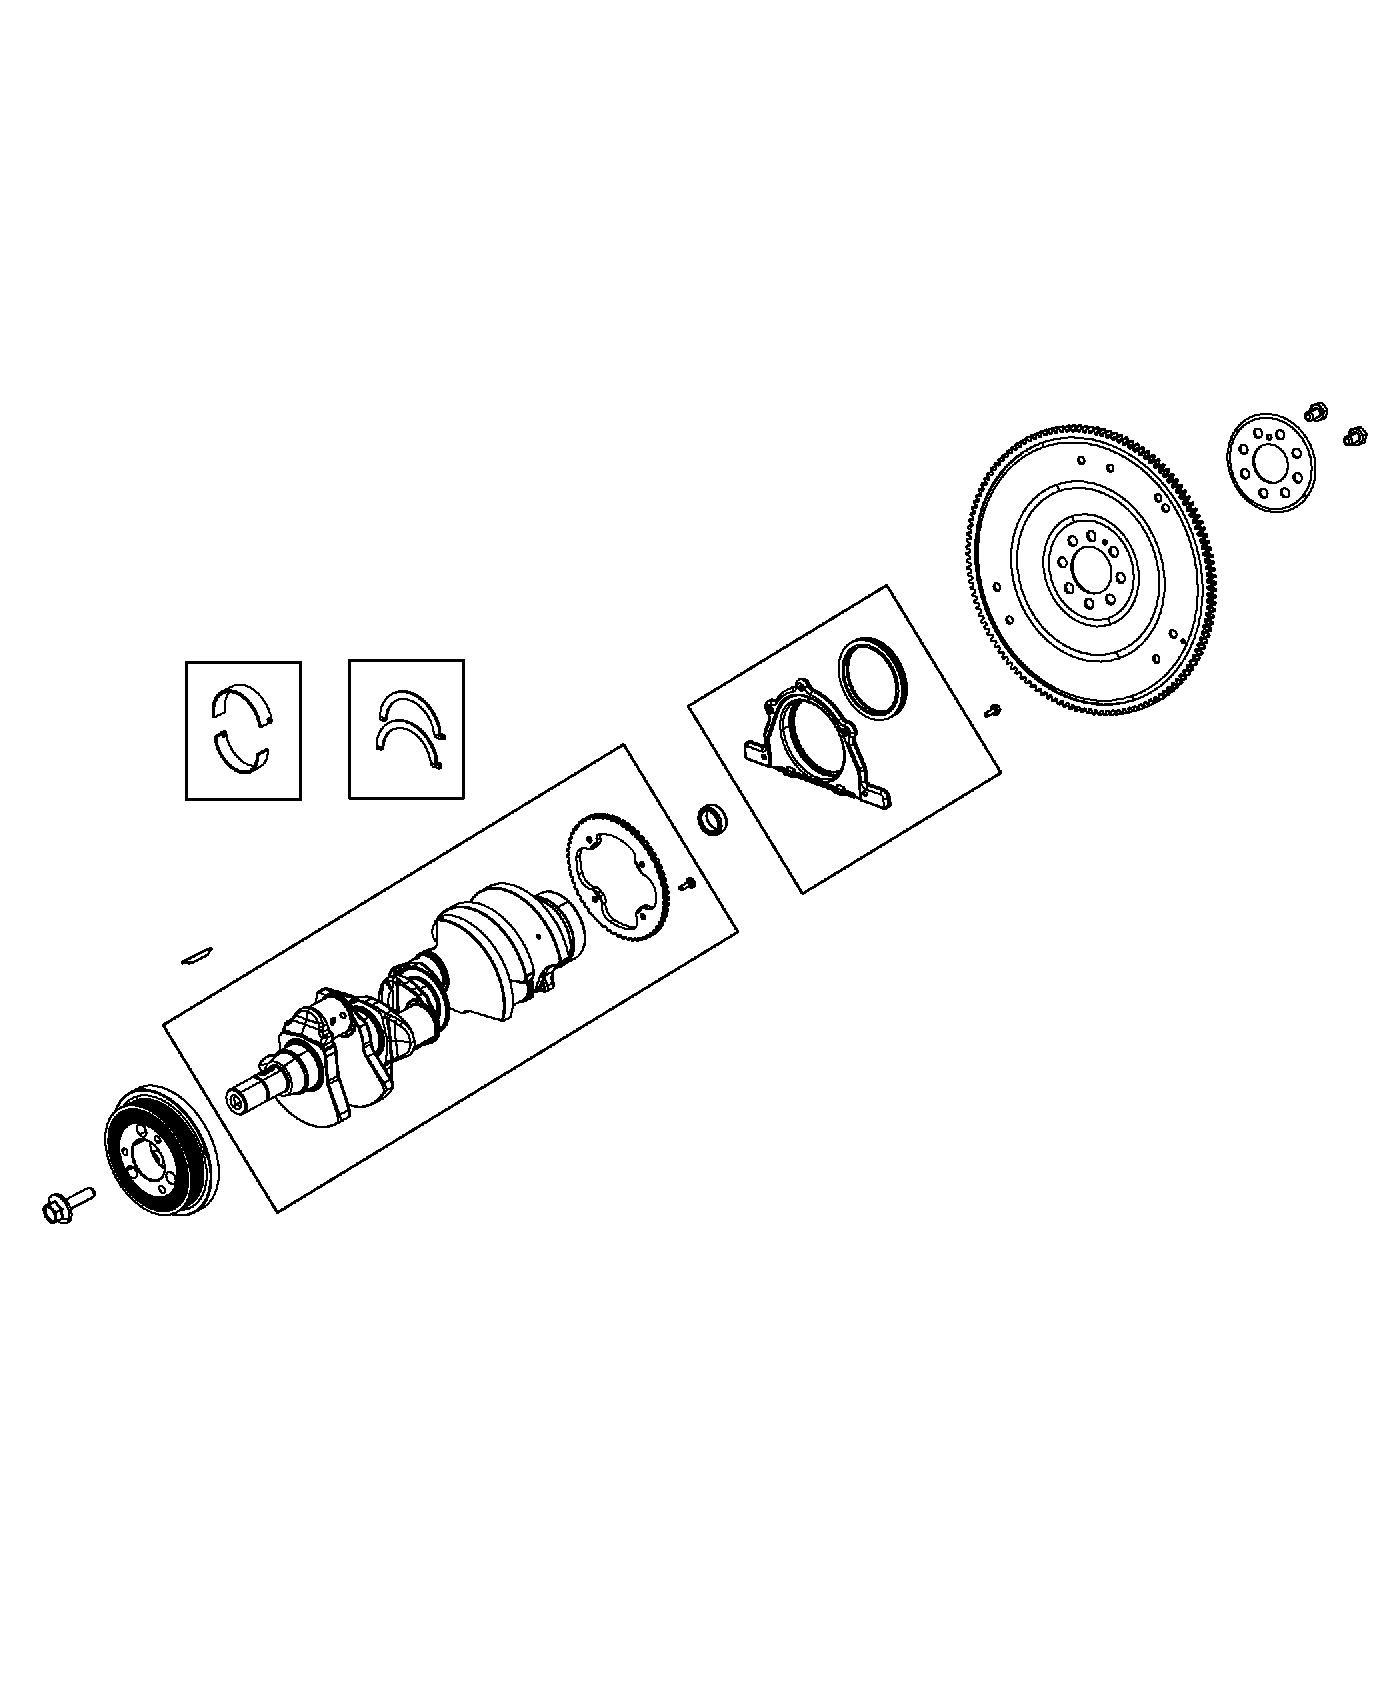 Ram Bearing Kit Crankshaft B Grade Standard